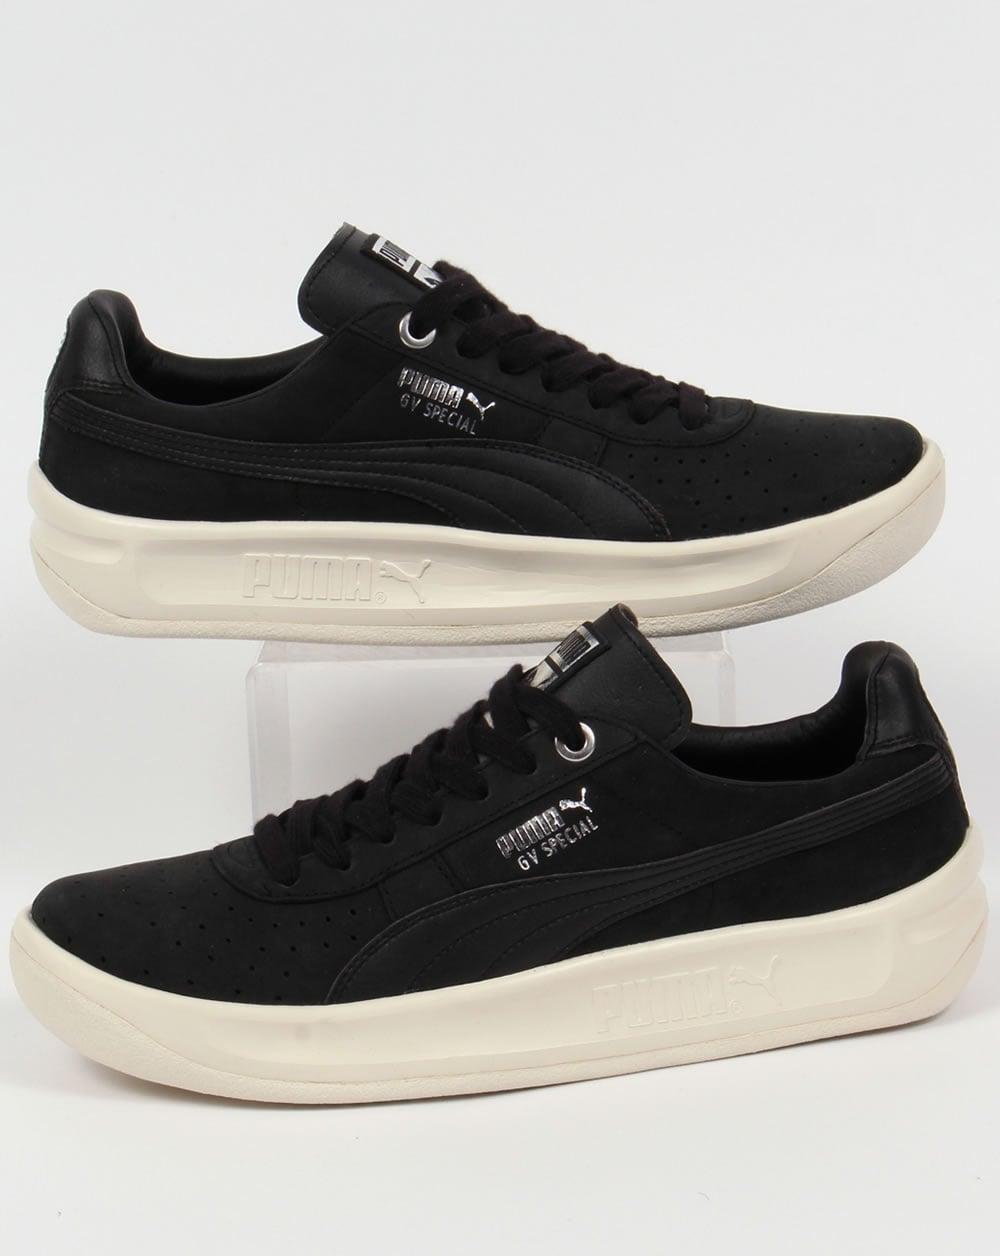 new arrival c6dfe e2d4d Buy puma gv,slippers puma,Fine - Shoes Discount for sale